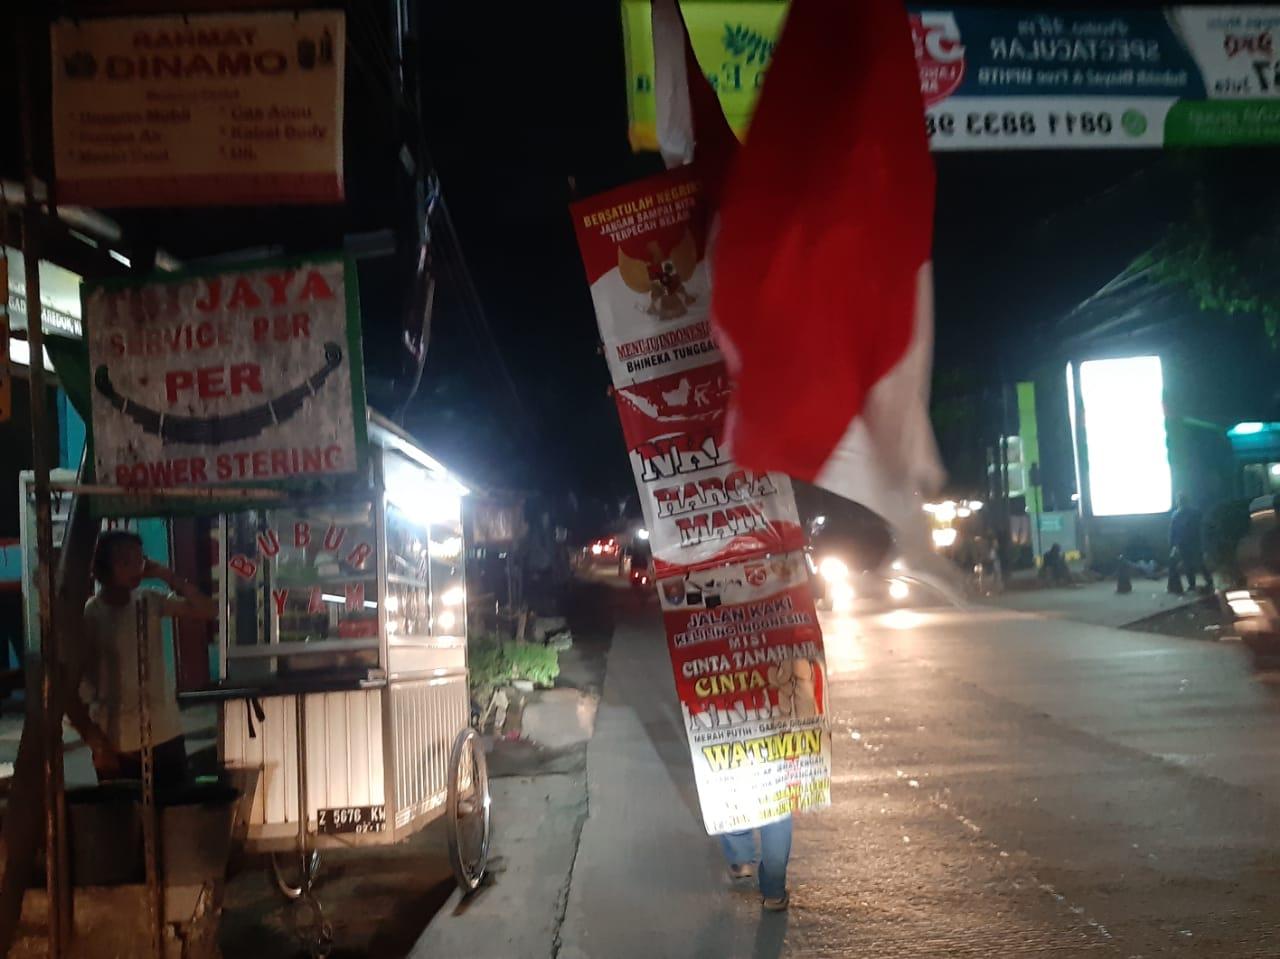 Seorang pria Watimin, 39, pria asal Cilacap, Jawa Tengah berkeliling Indonesia dengan berjalan kaki.